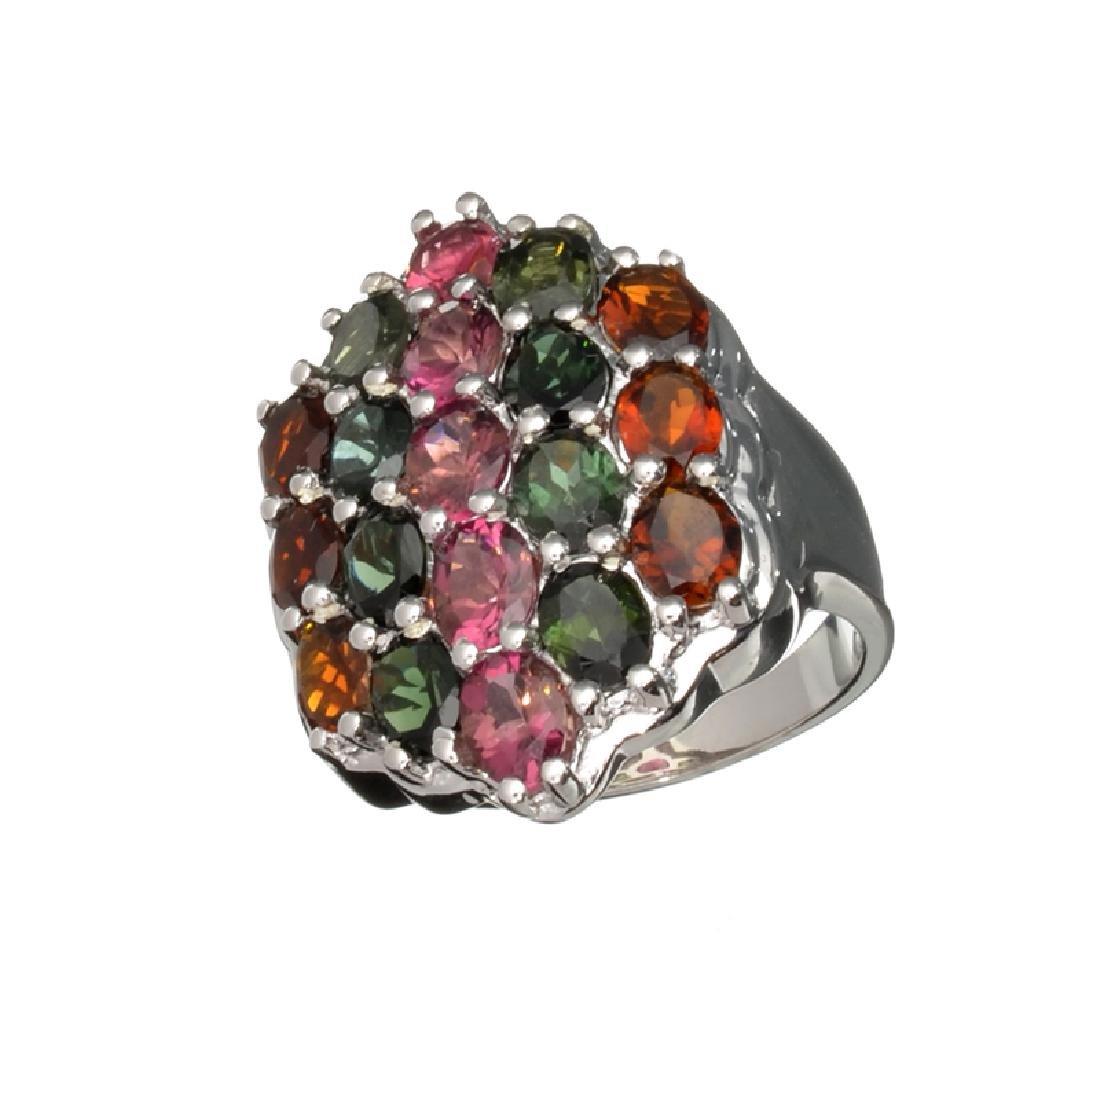 4.50CT Oval Cut Multi-Colored Multi Precious Gemstones